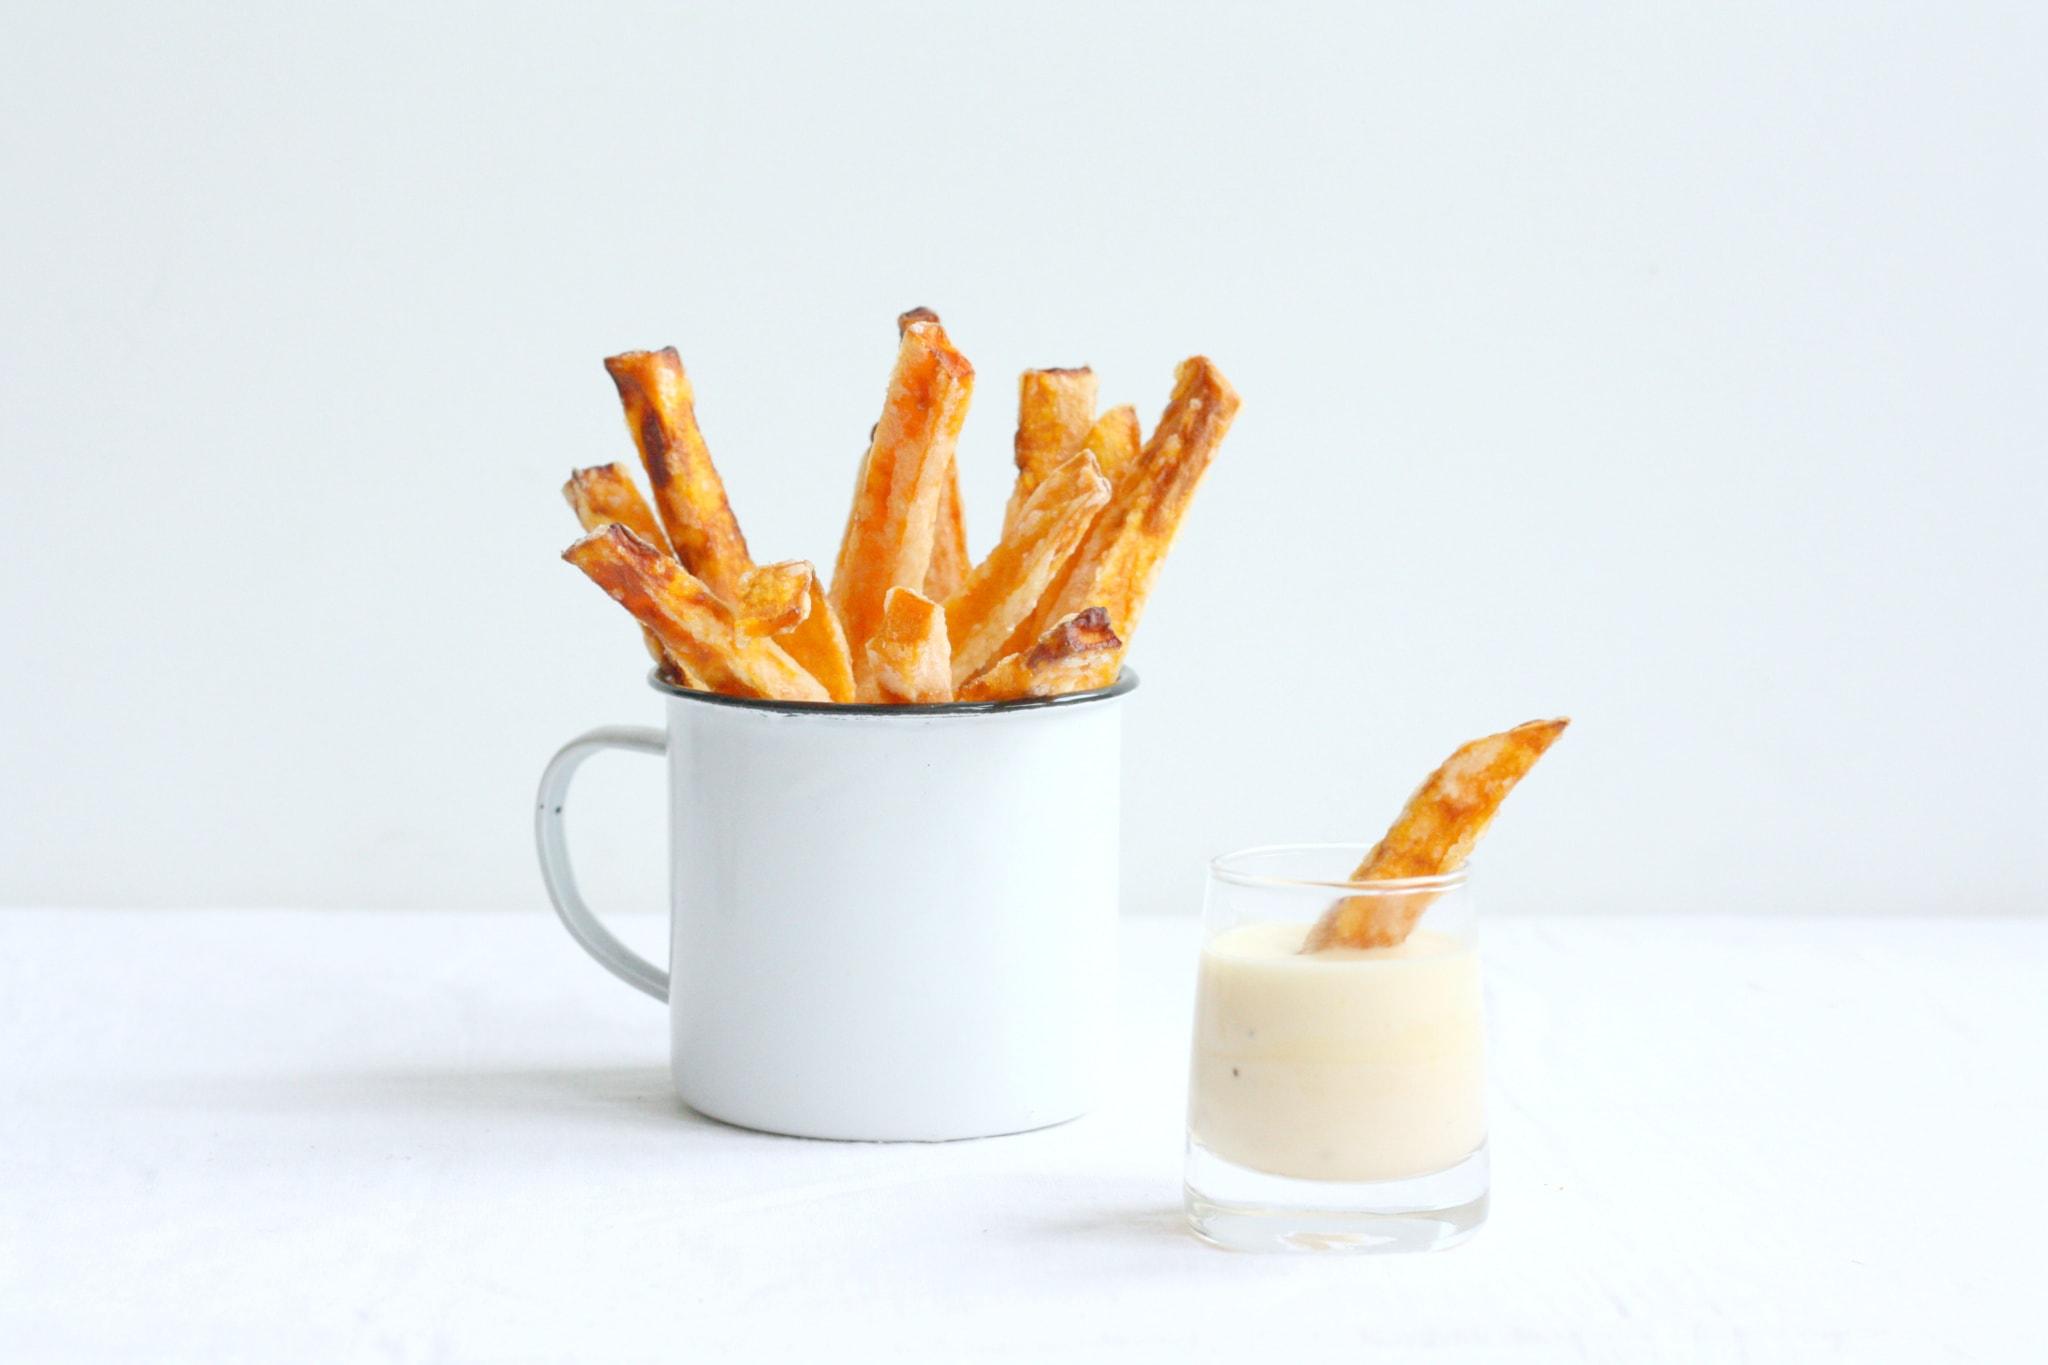 filippo berio mayonaise culinessa2